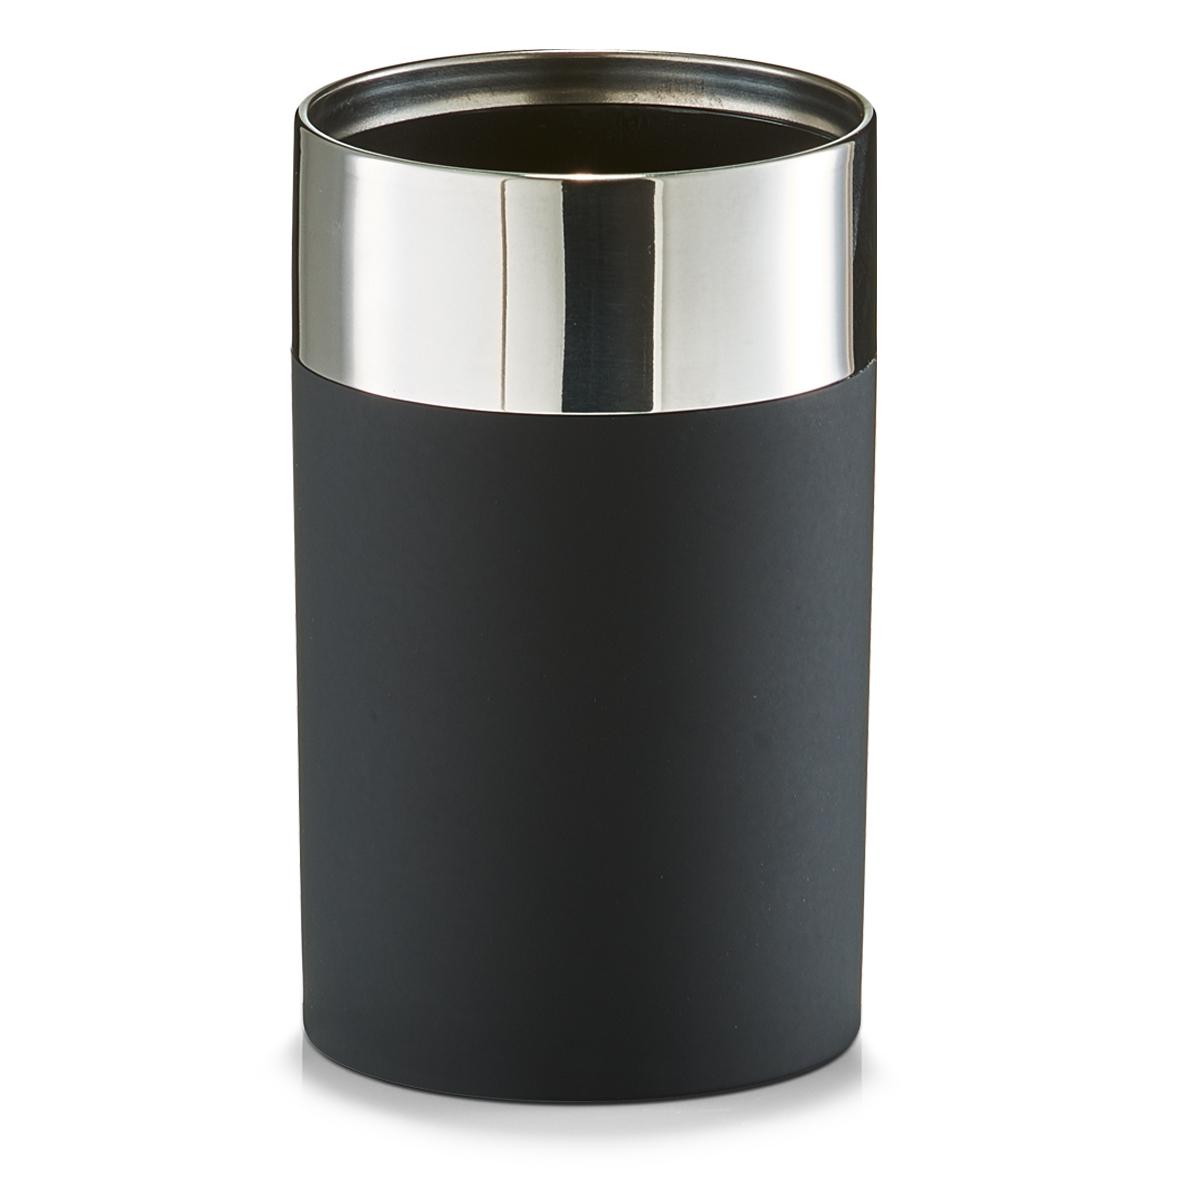 Pahar pentru periuta din plastic si inox Black matte O 65xH11 cm